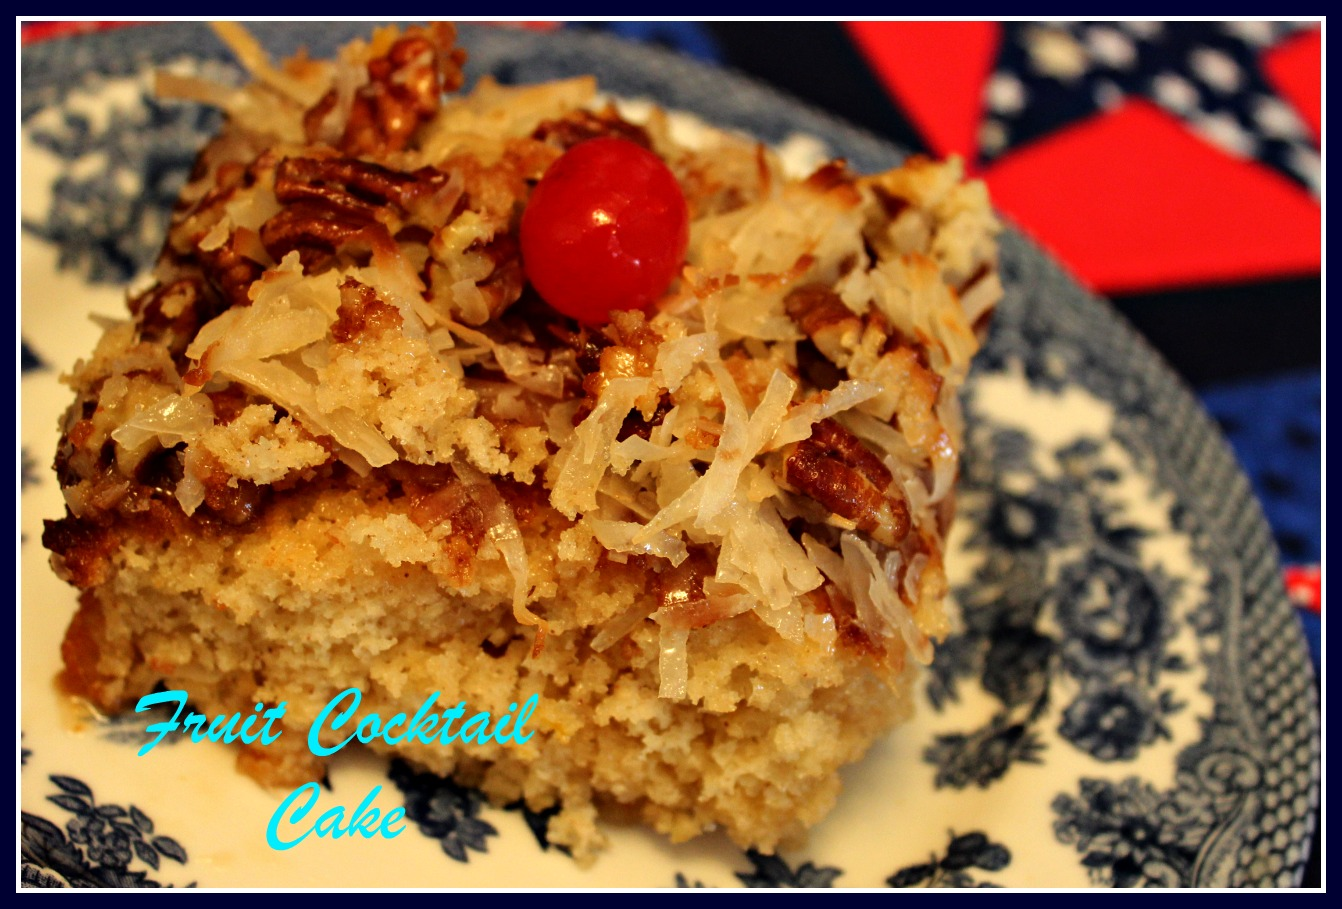 Pin Fruit Cocktail Butter Cake Cake on Pinterest